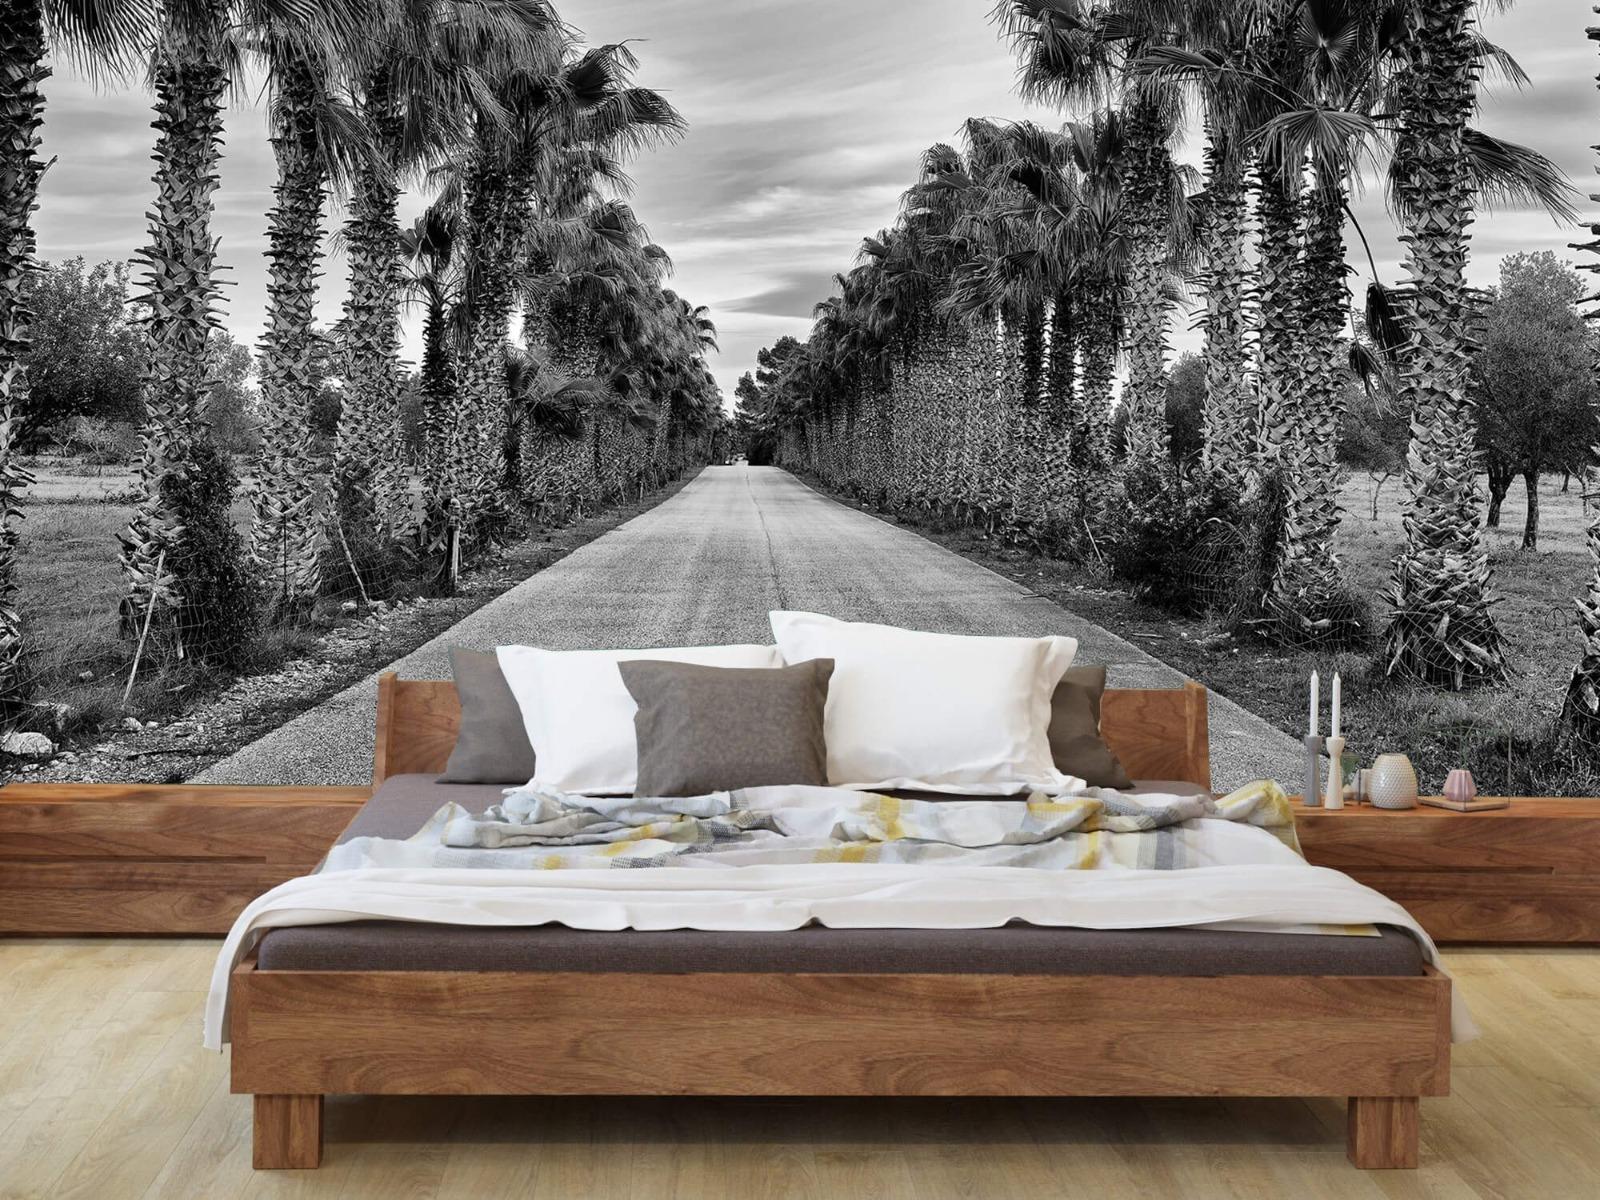 Palmbomen - Straat met palmbomen - Woonkamer 7